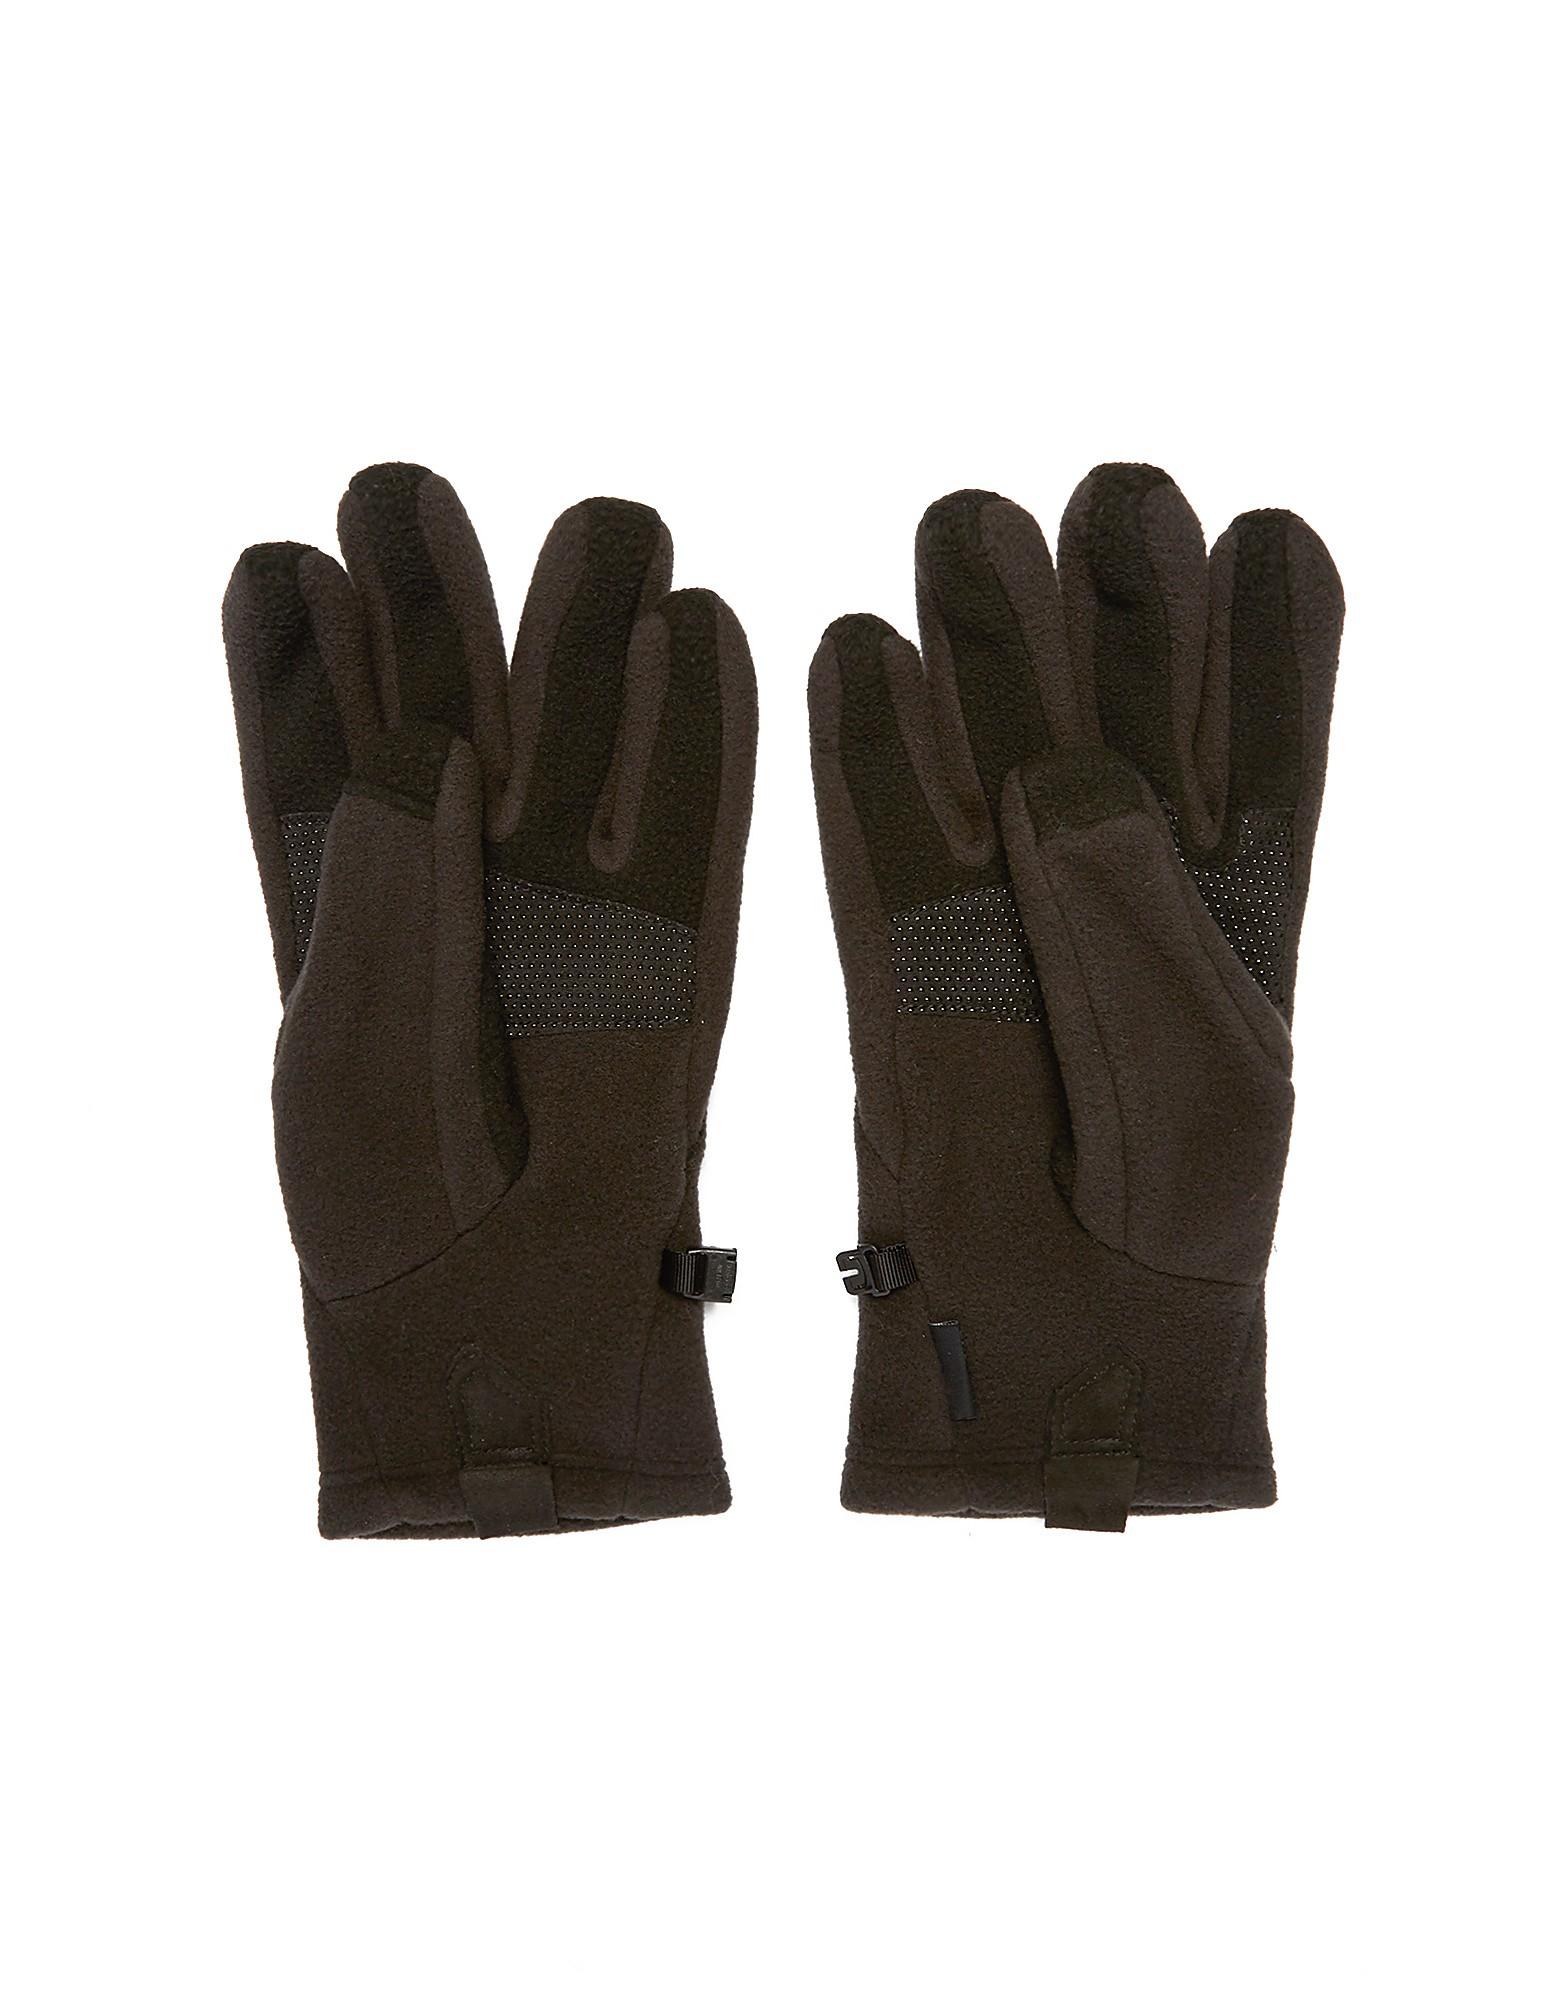 The North Face Denali Etip Gloves